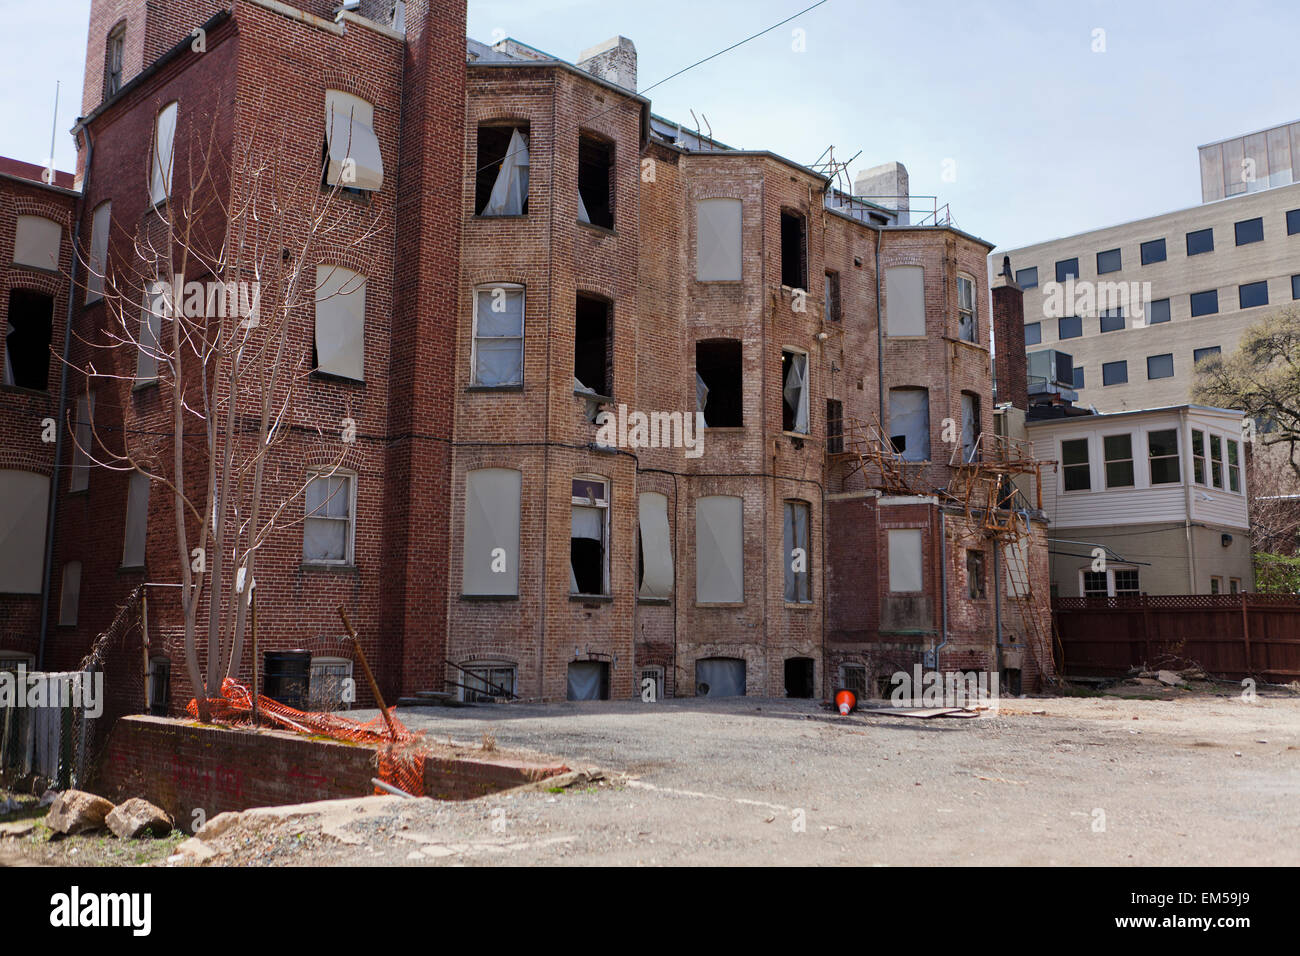 Vacant brick apartment building - Washington, DC USA - Stock Image